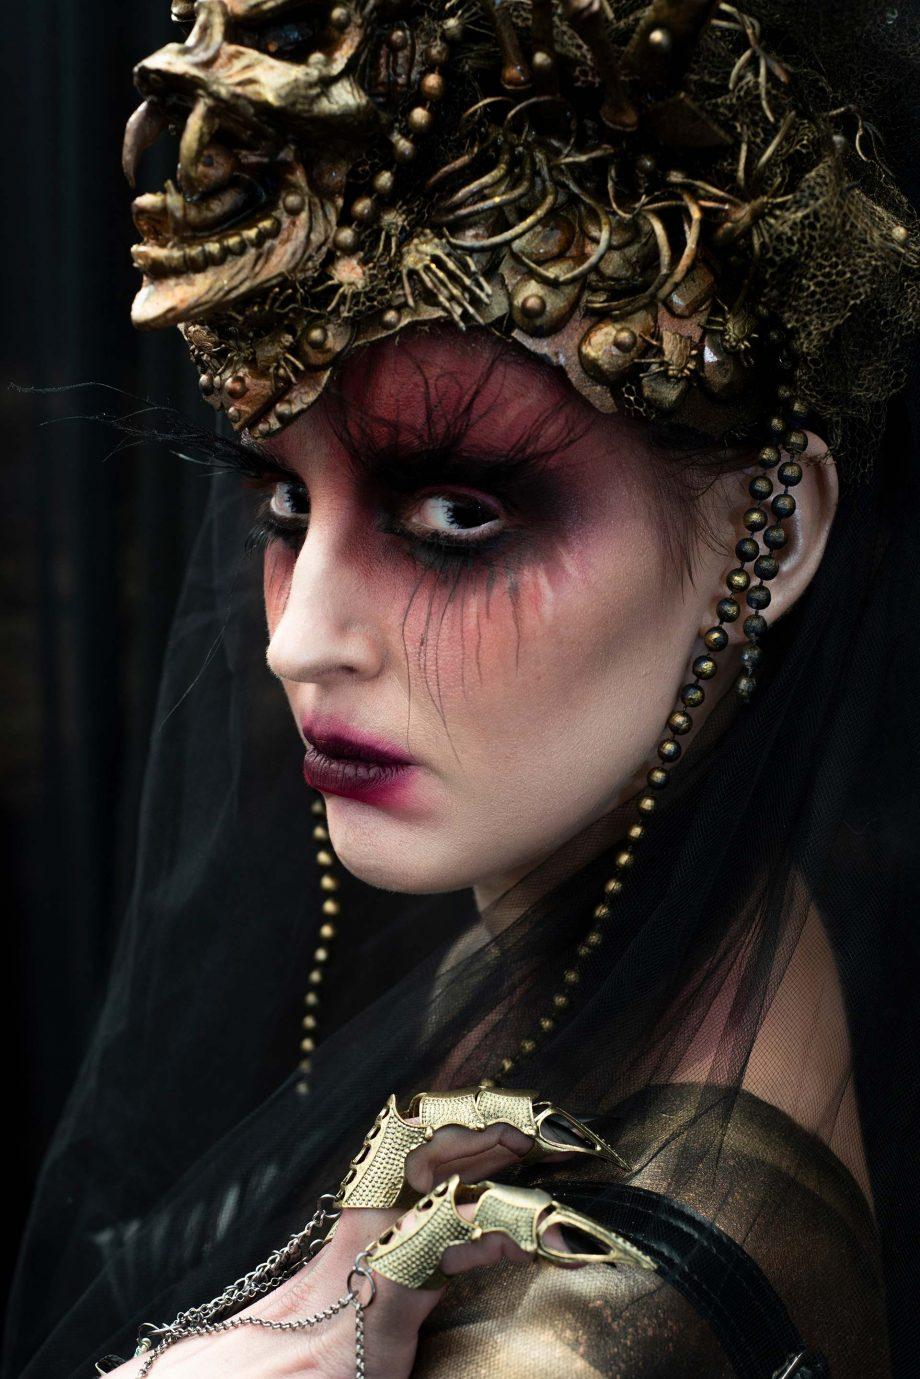 Daemon Cadmon, IMATS, demo, makeup artistry, airbrush